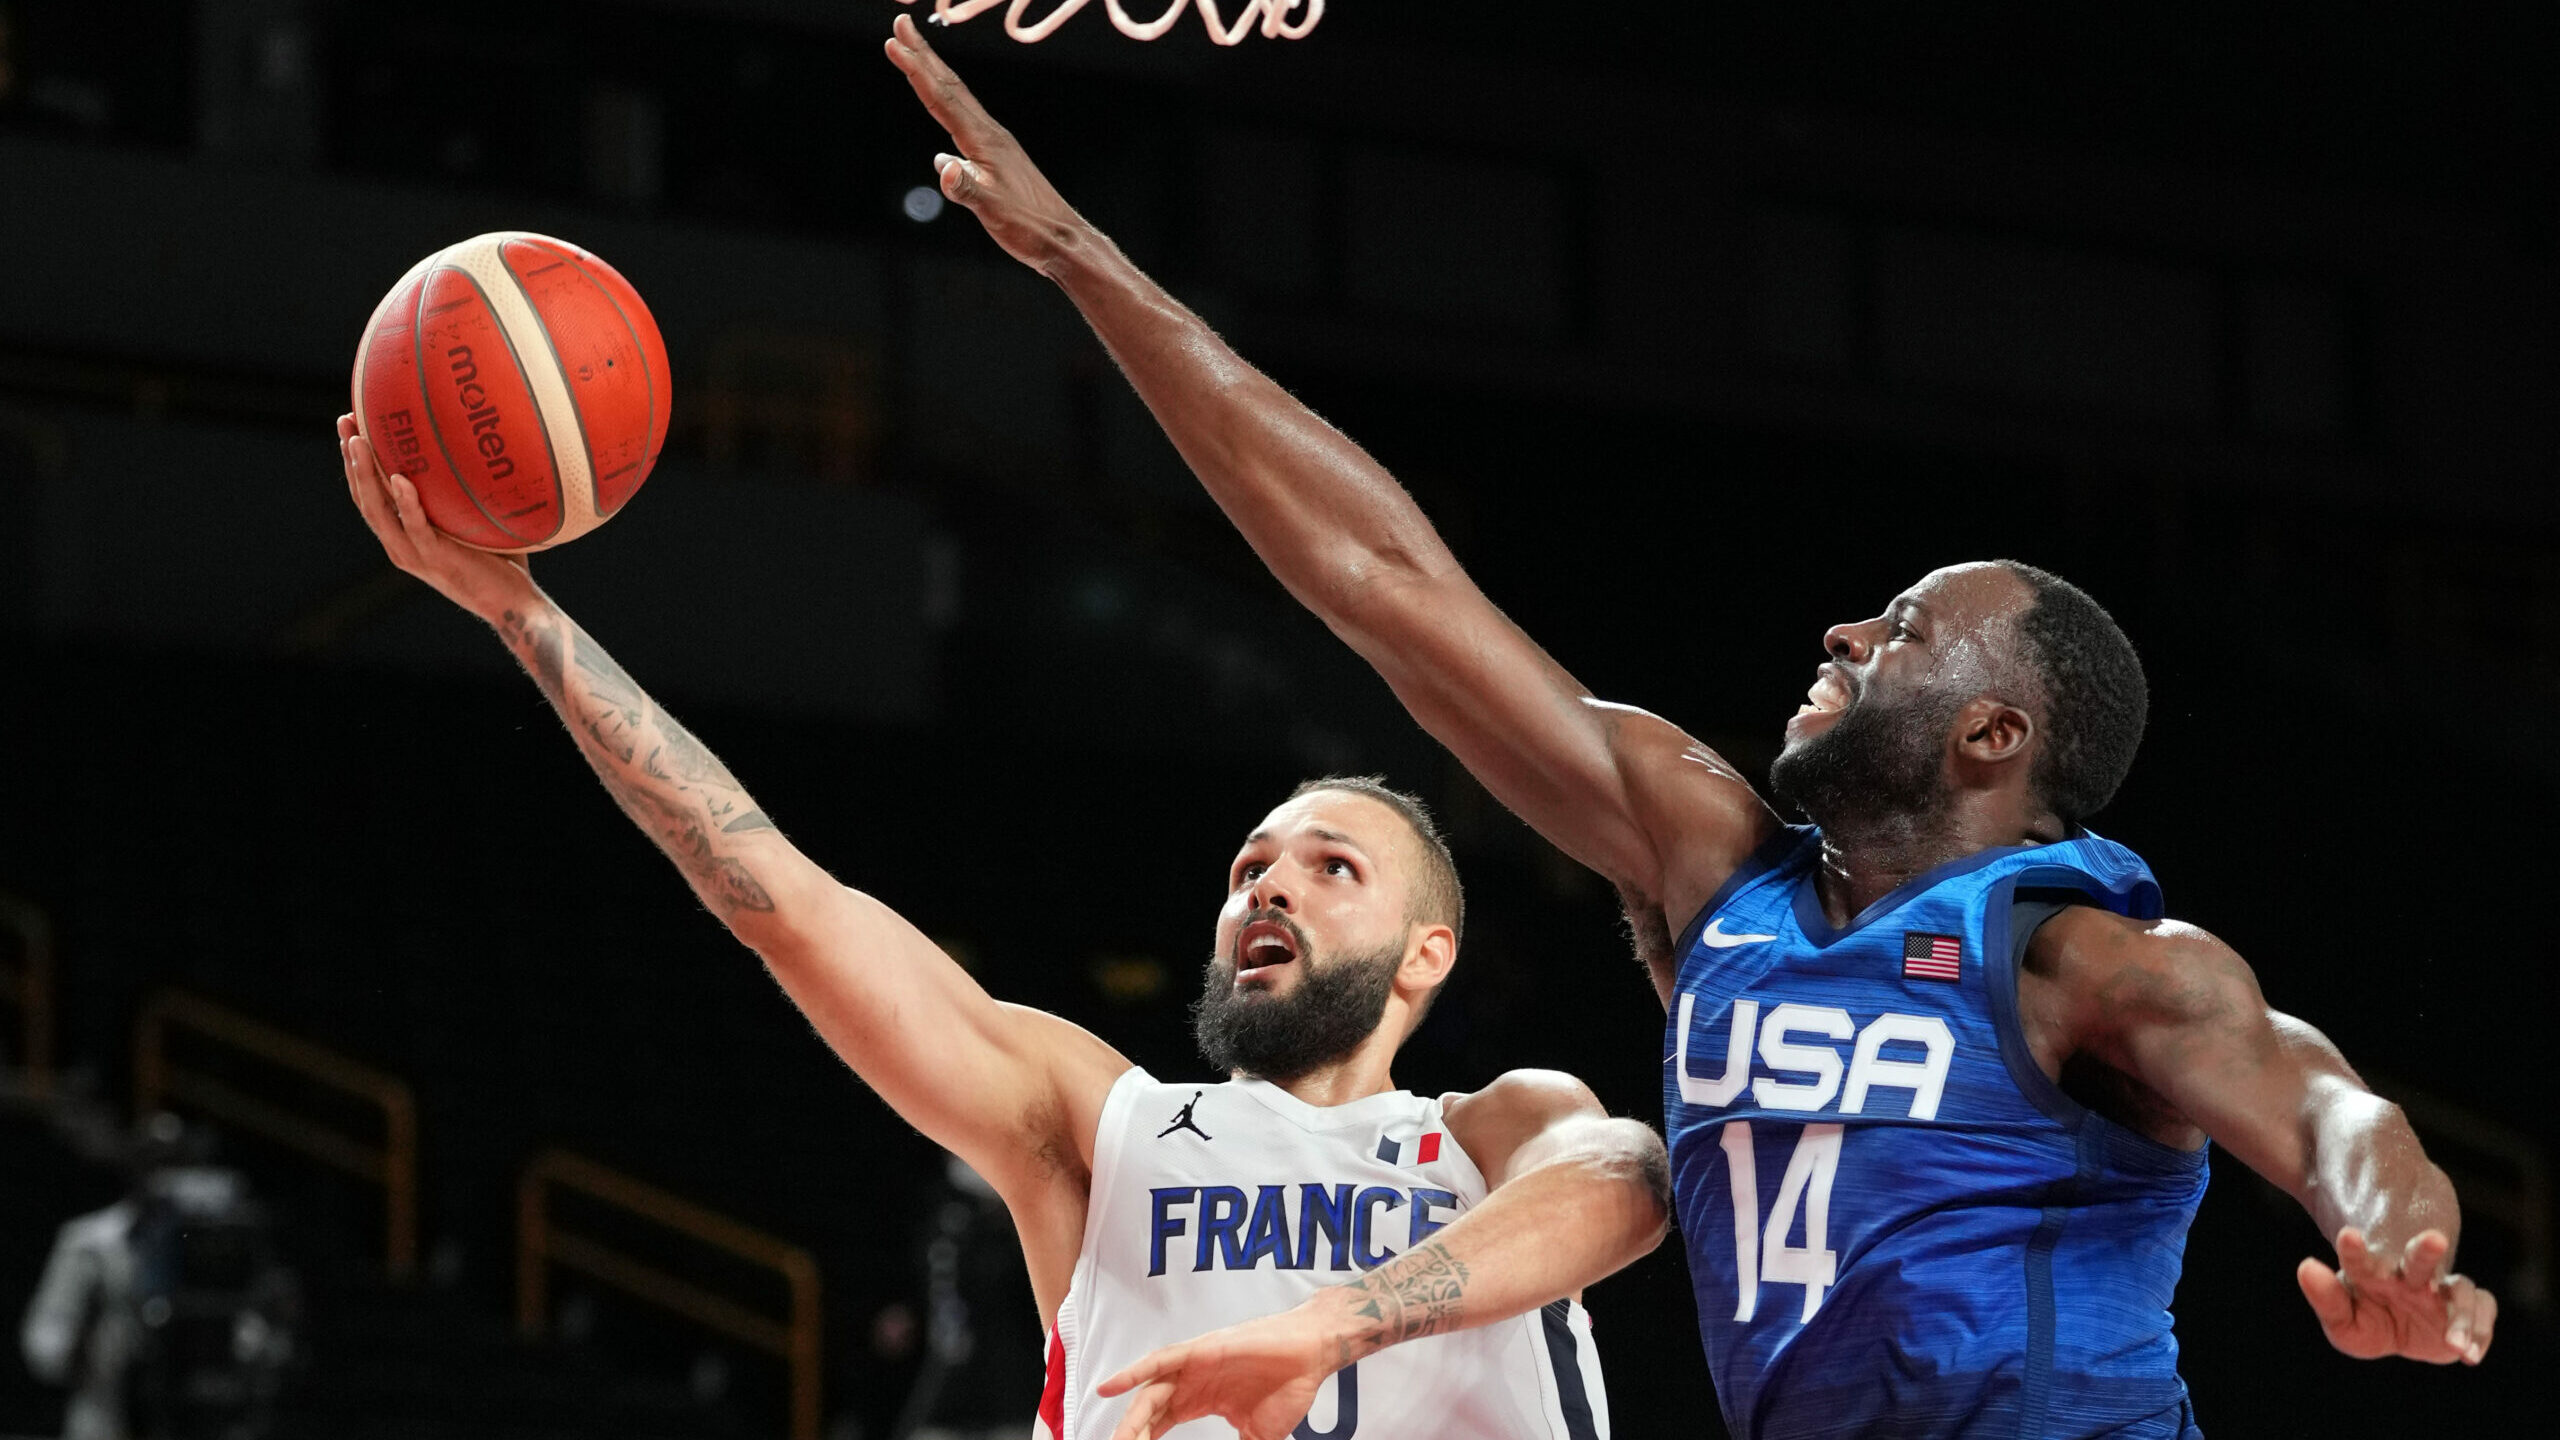 France rallies to hand USA first Olympics loss since 2004